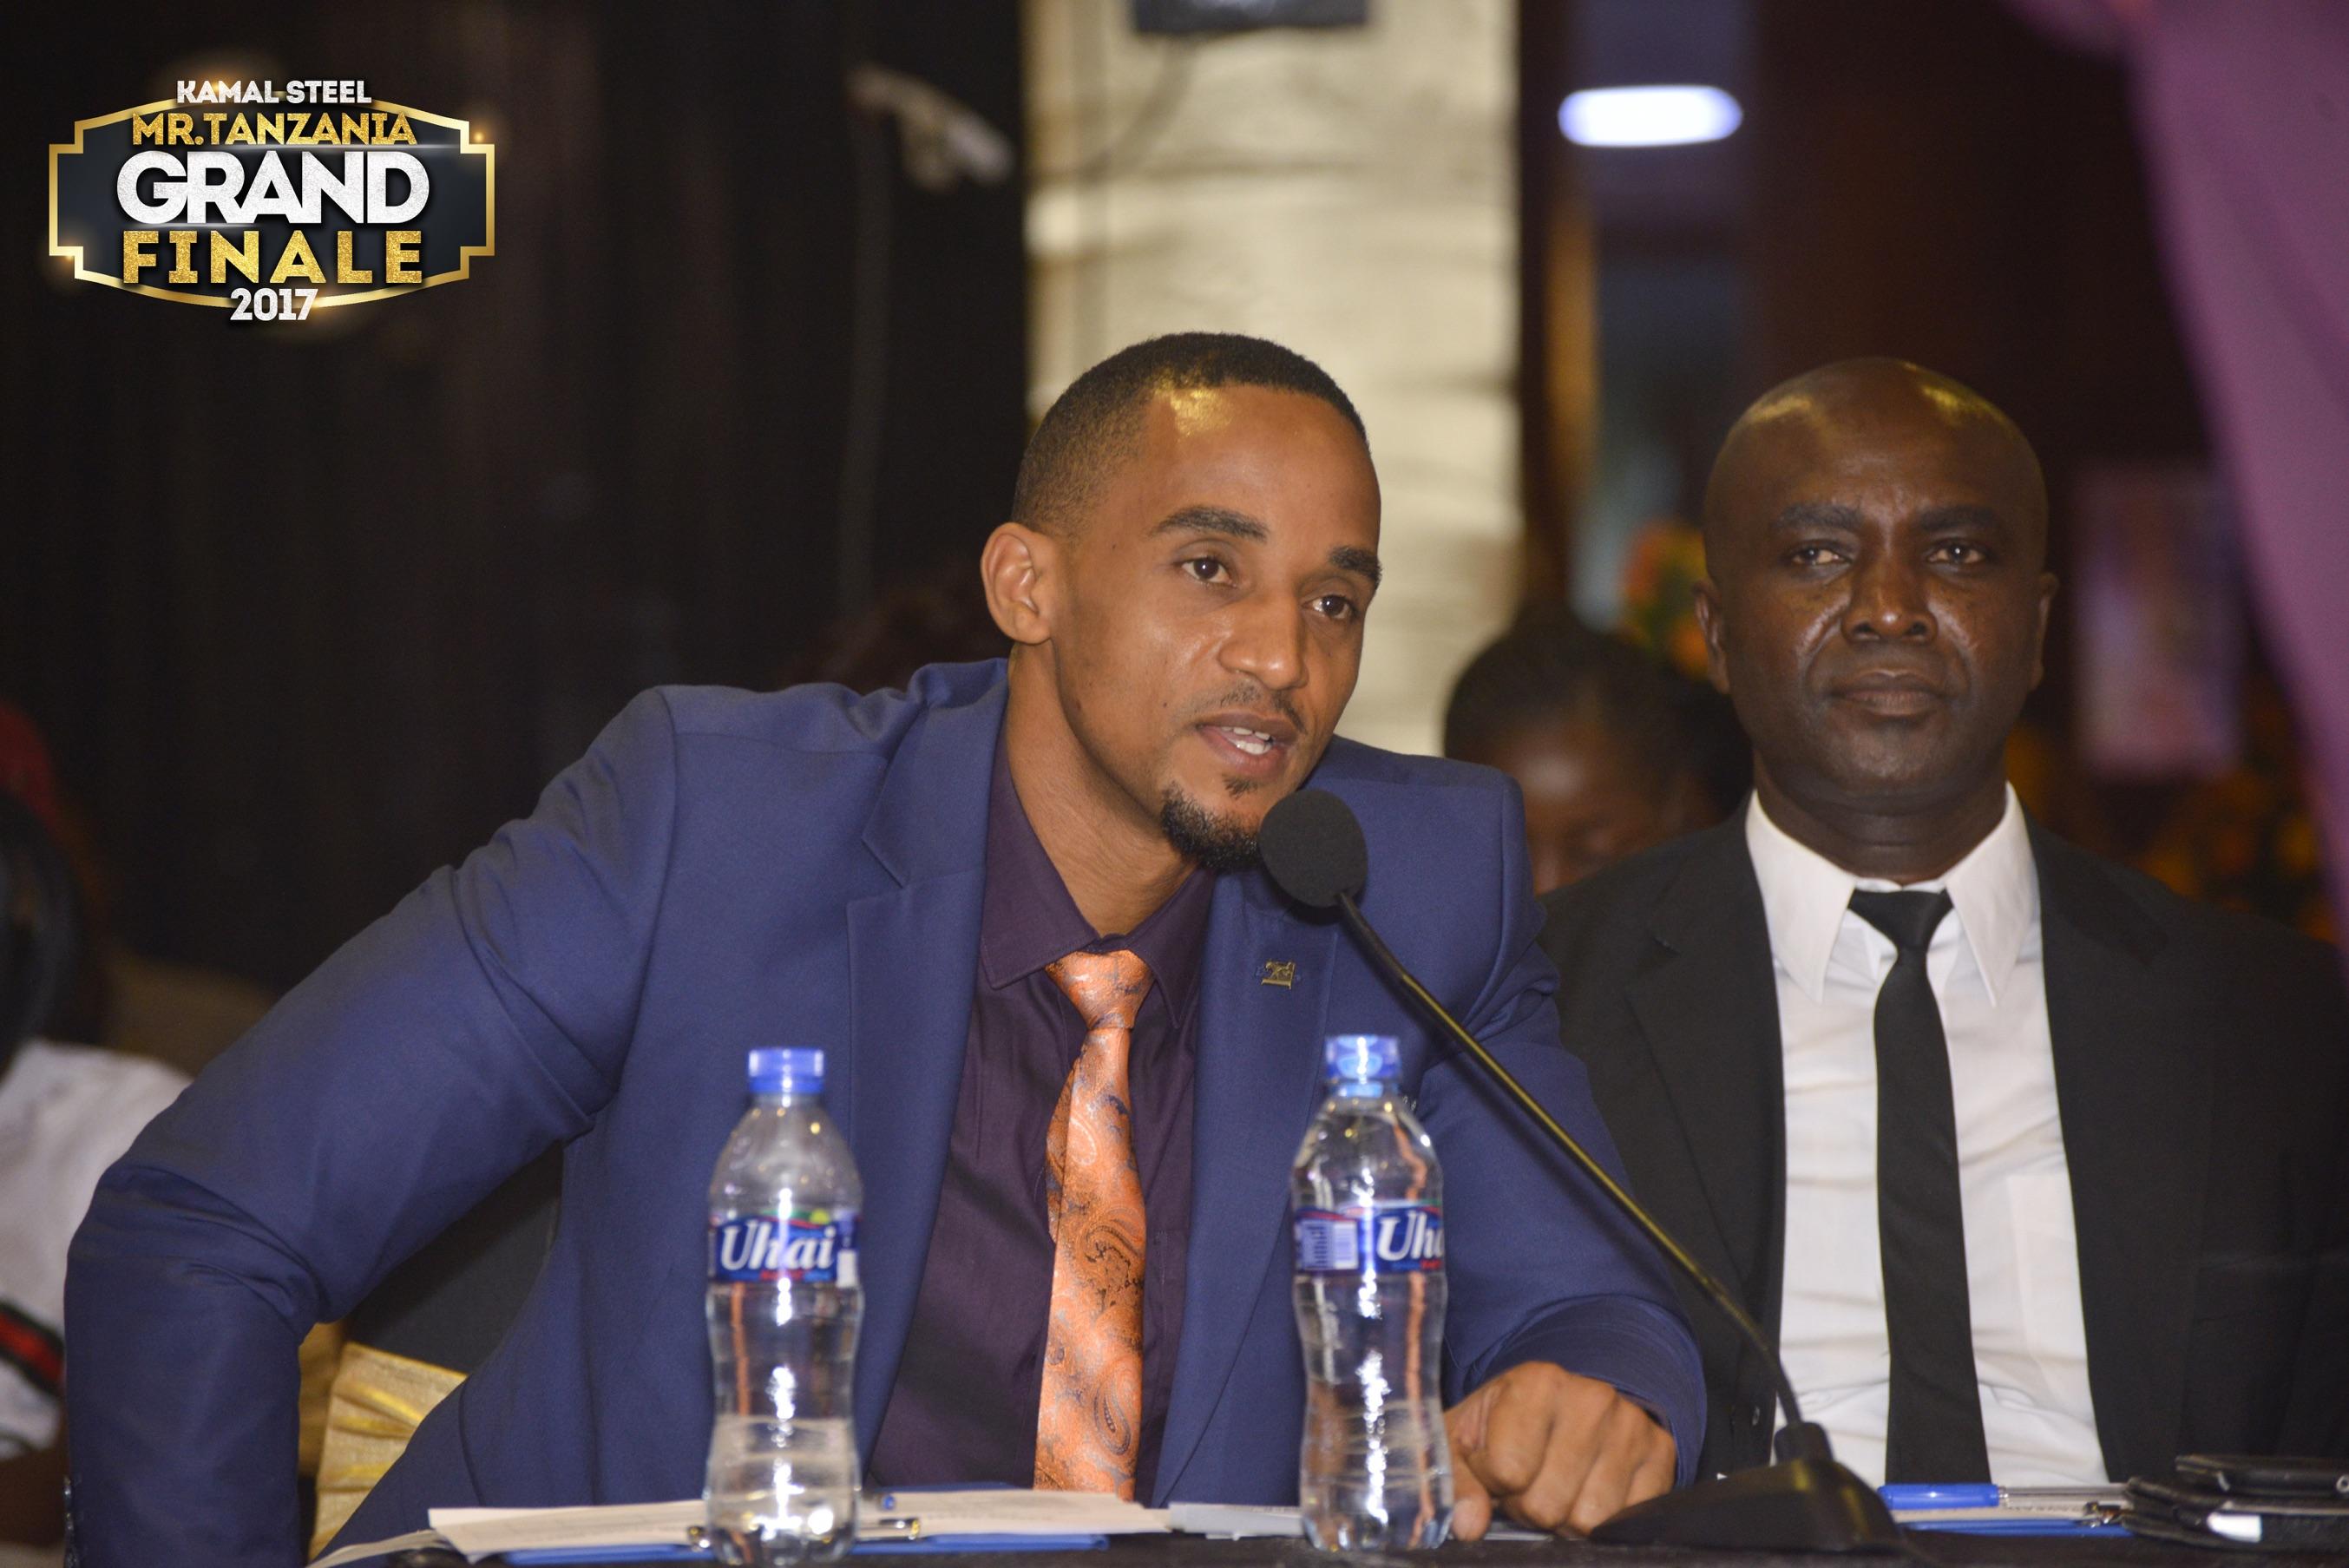 Mr. Tanzania Judge-Bashir Iusendela